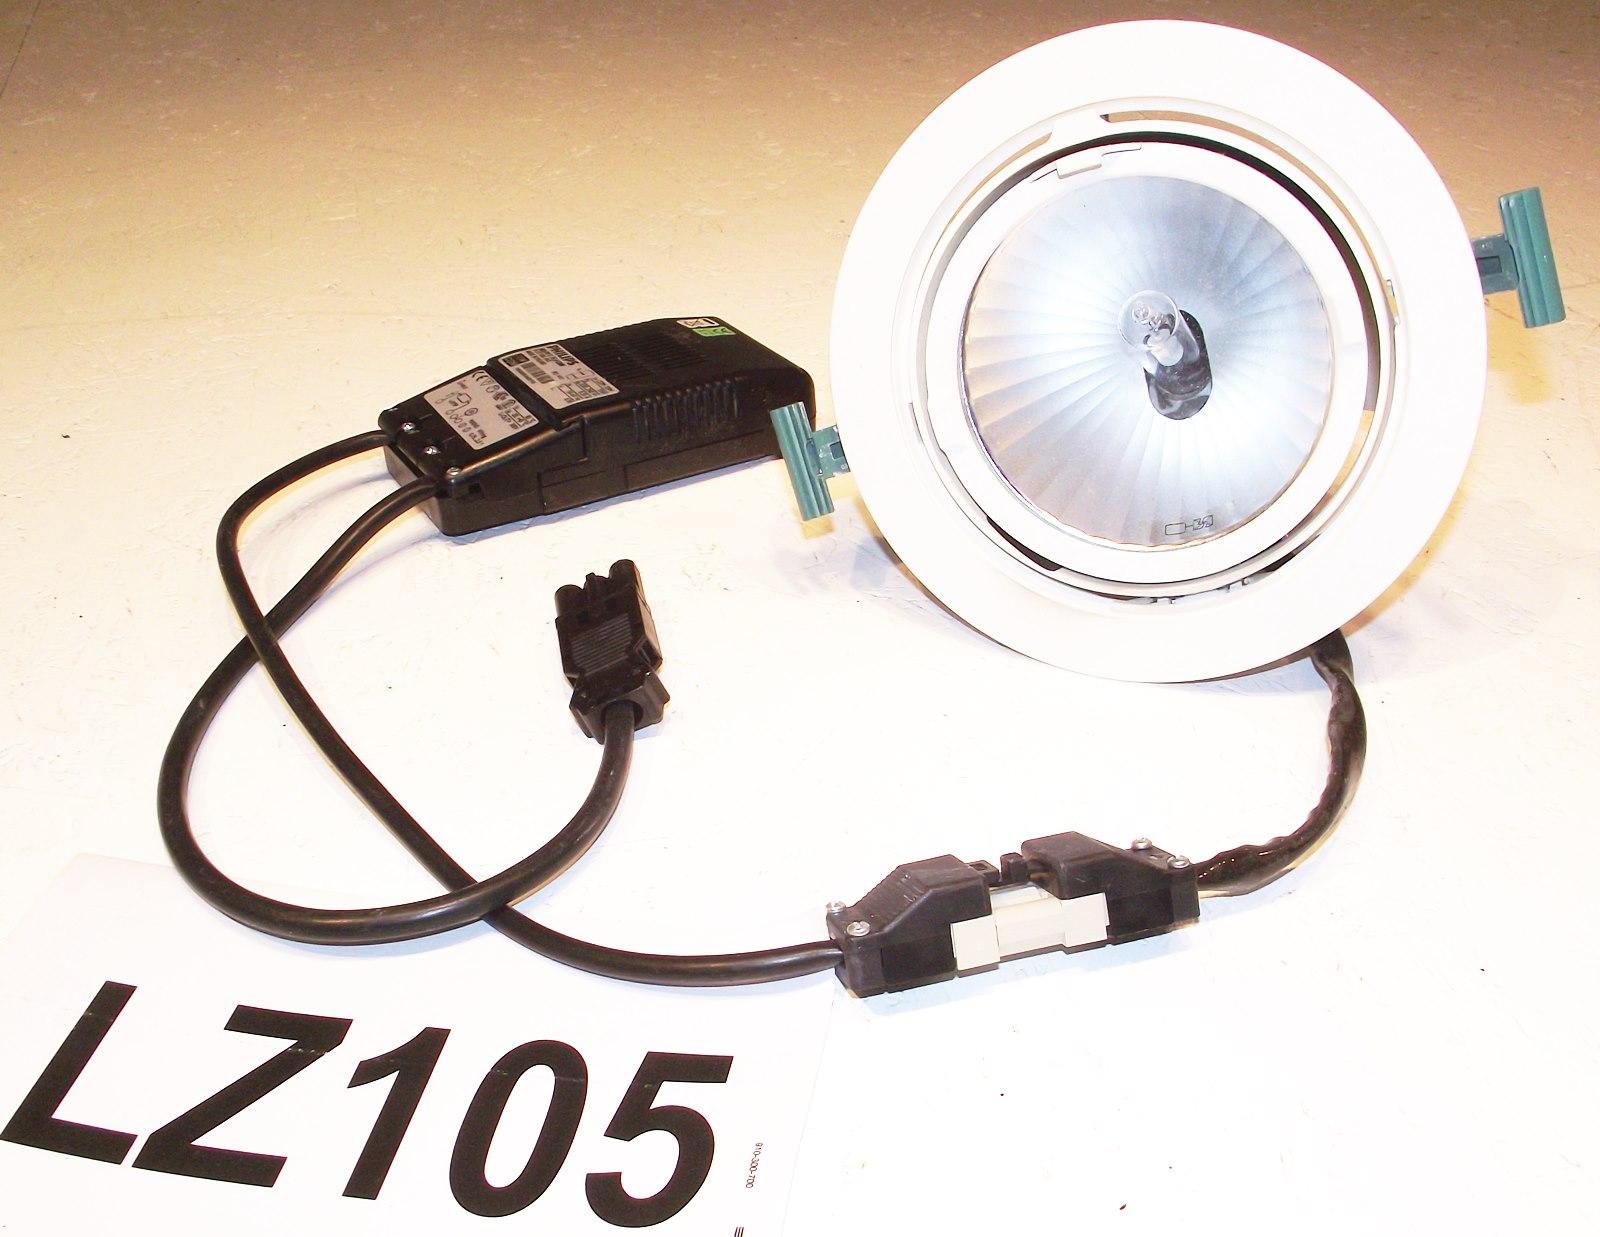 Philips deckenlampe hqi o led einbaulampe evg w hid pvc cdm